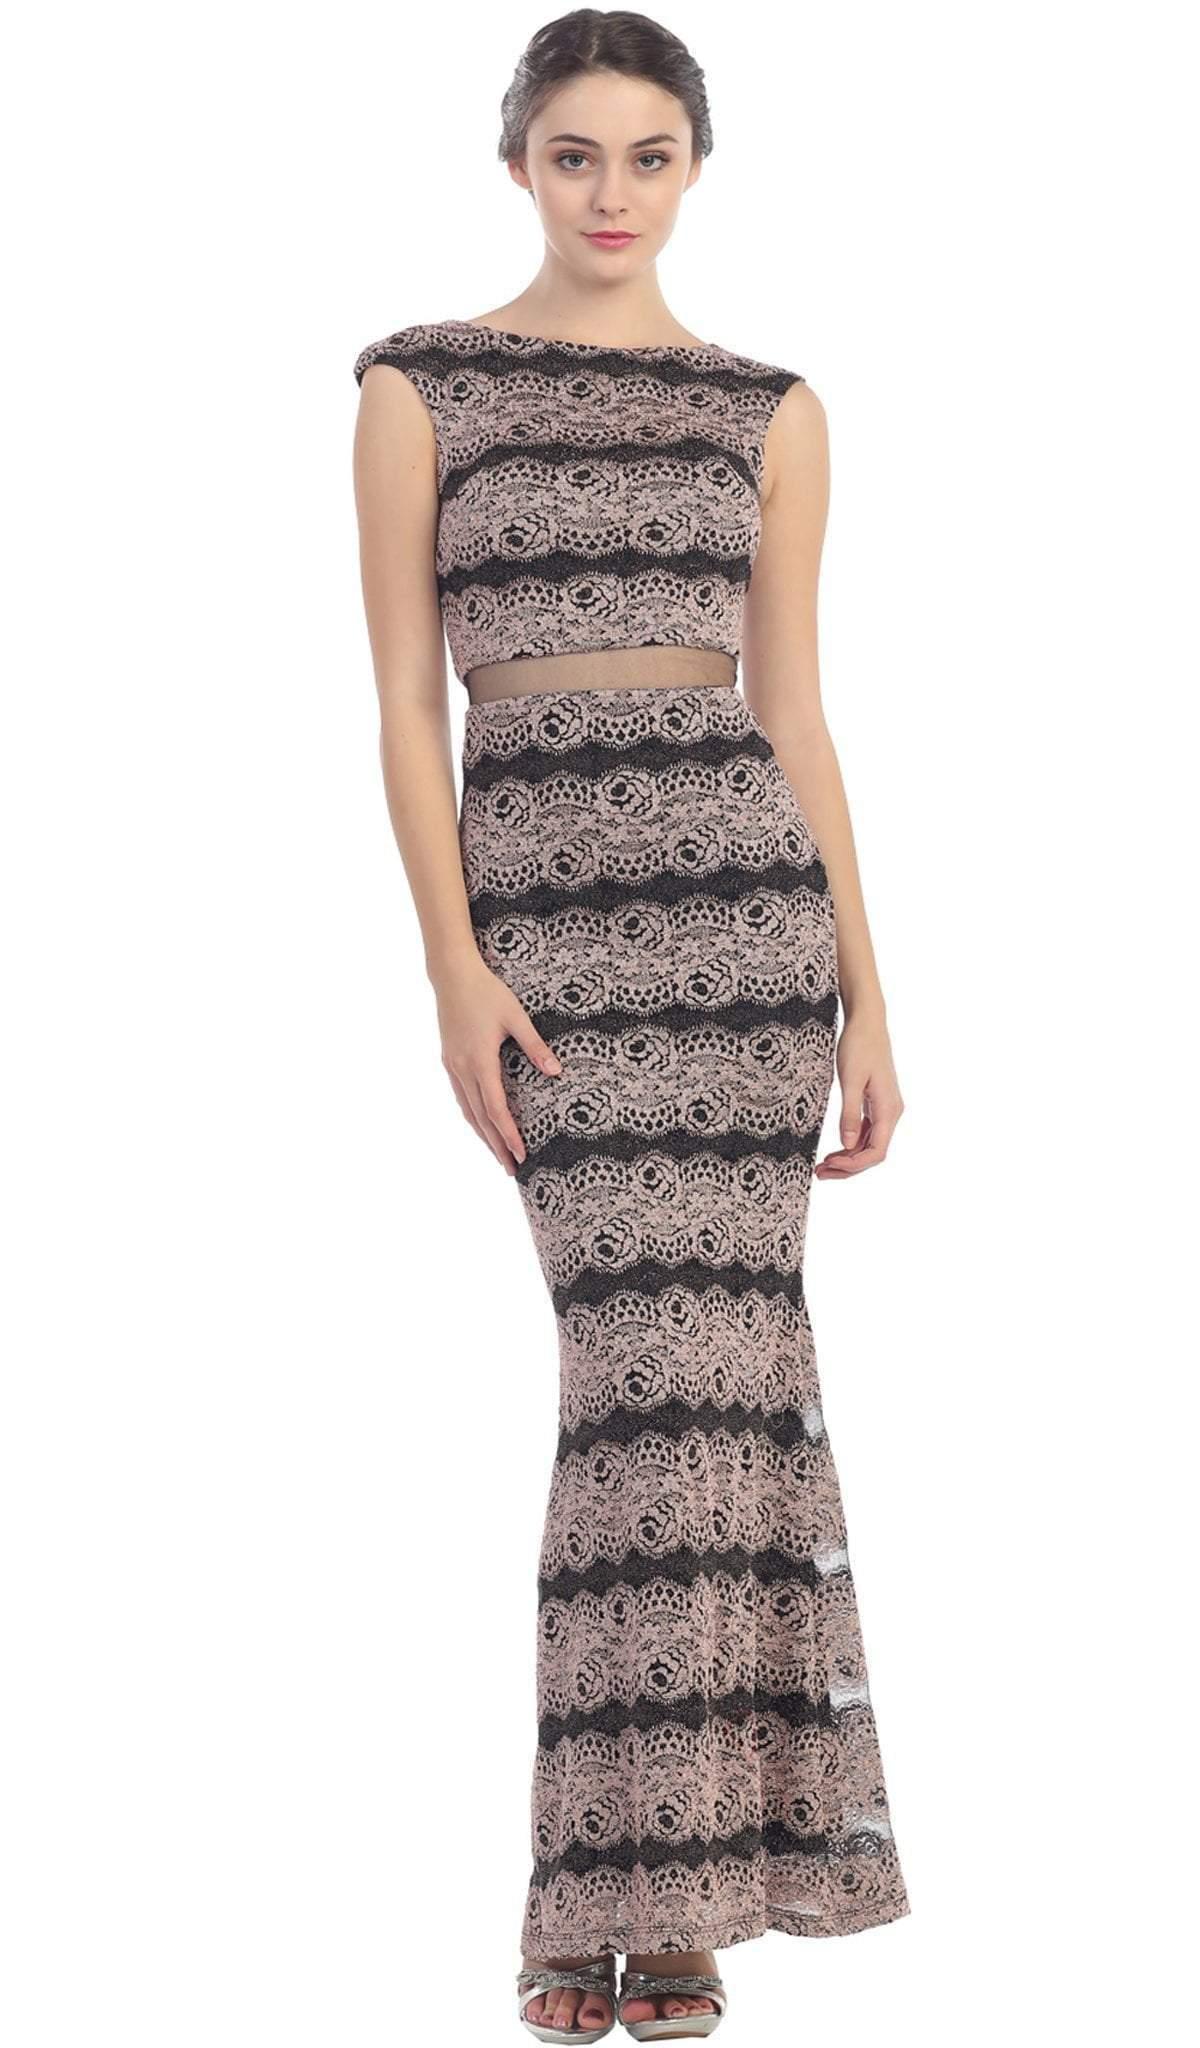 Eureka Fashion - Cap Sleeve Striped Metallic Mesh Sheath Evening Dress